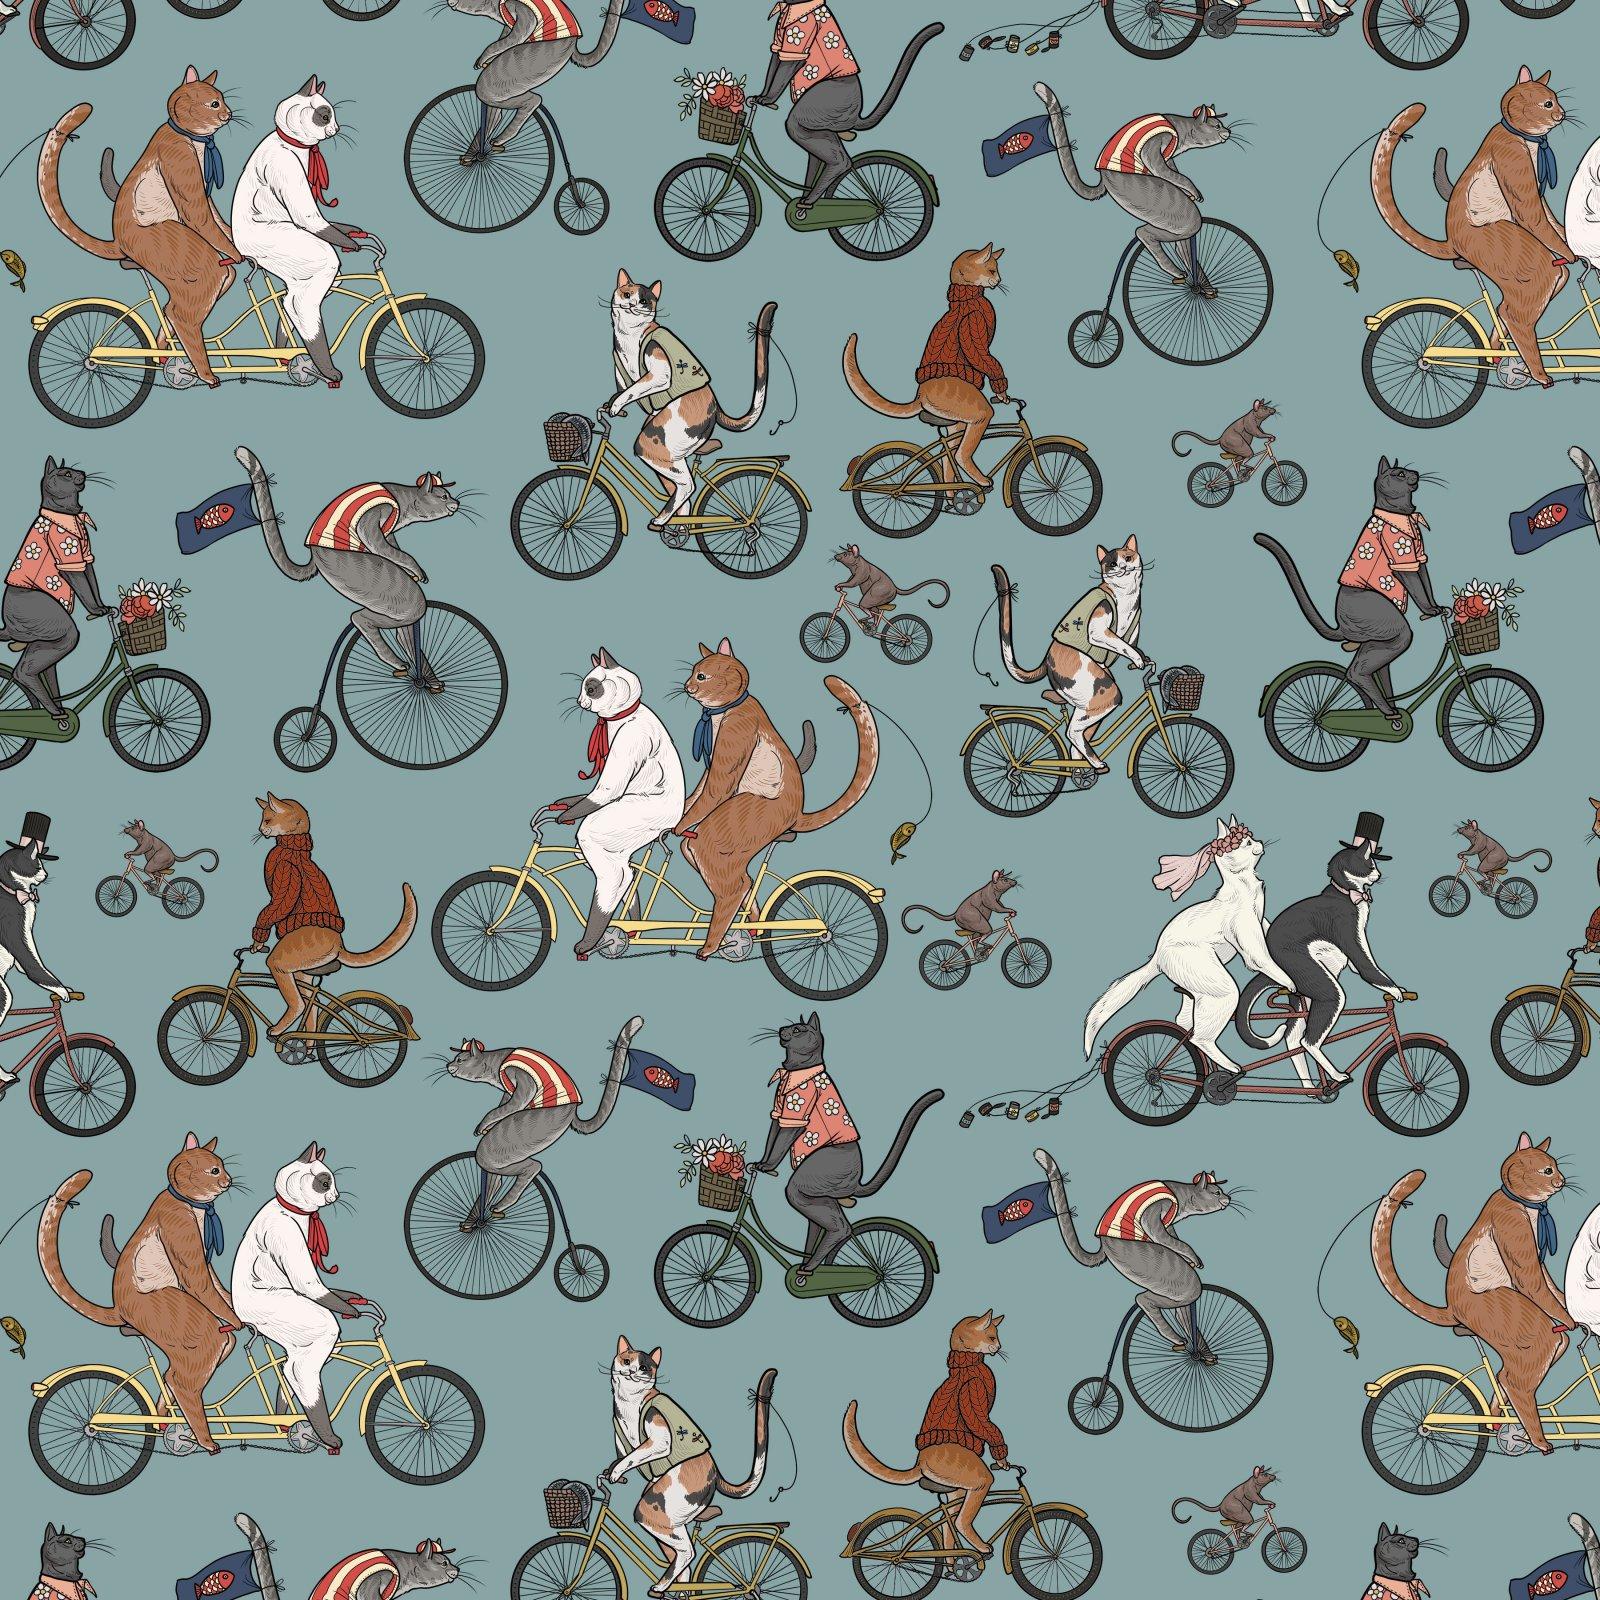 Cat Tales Bicycle Race Aquifer